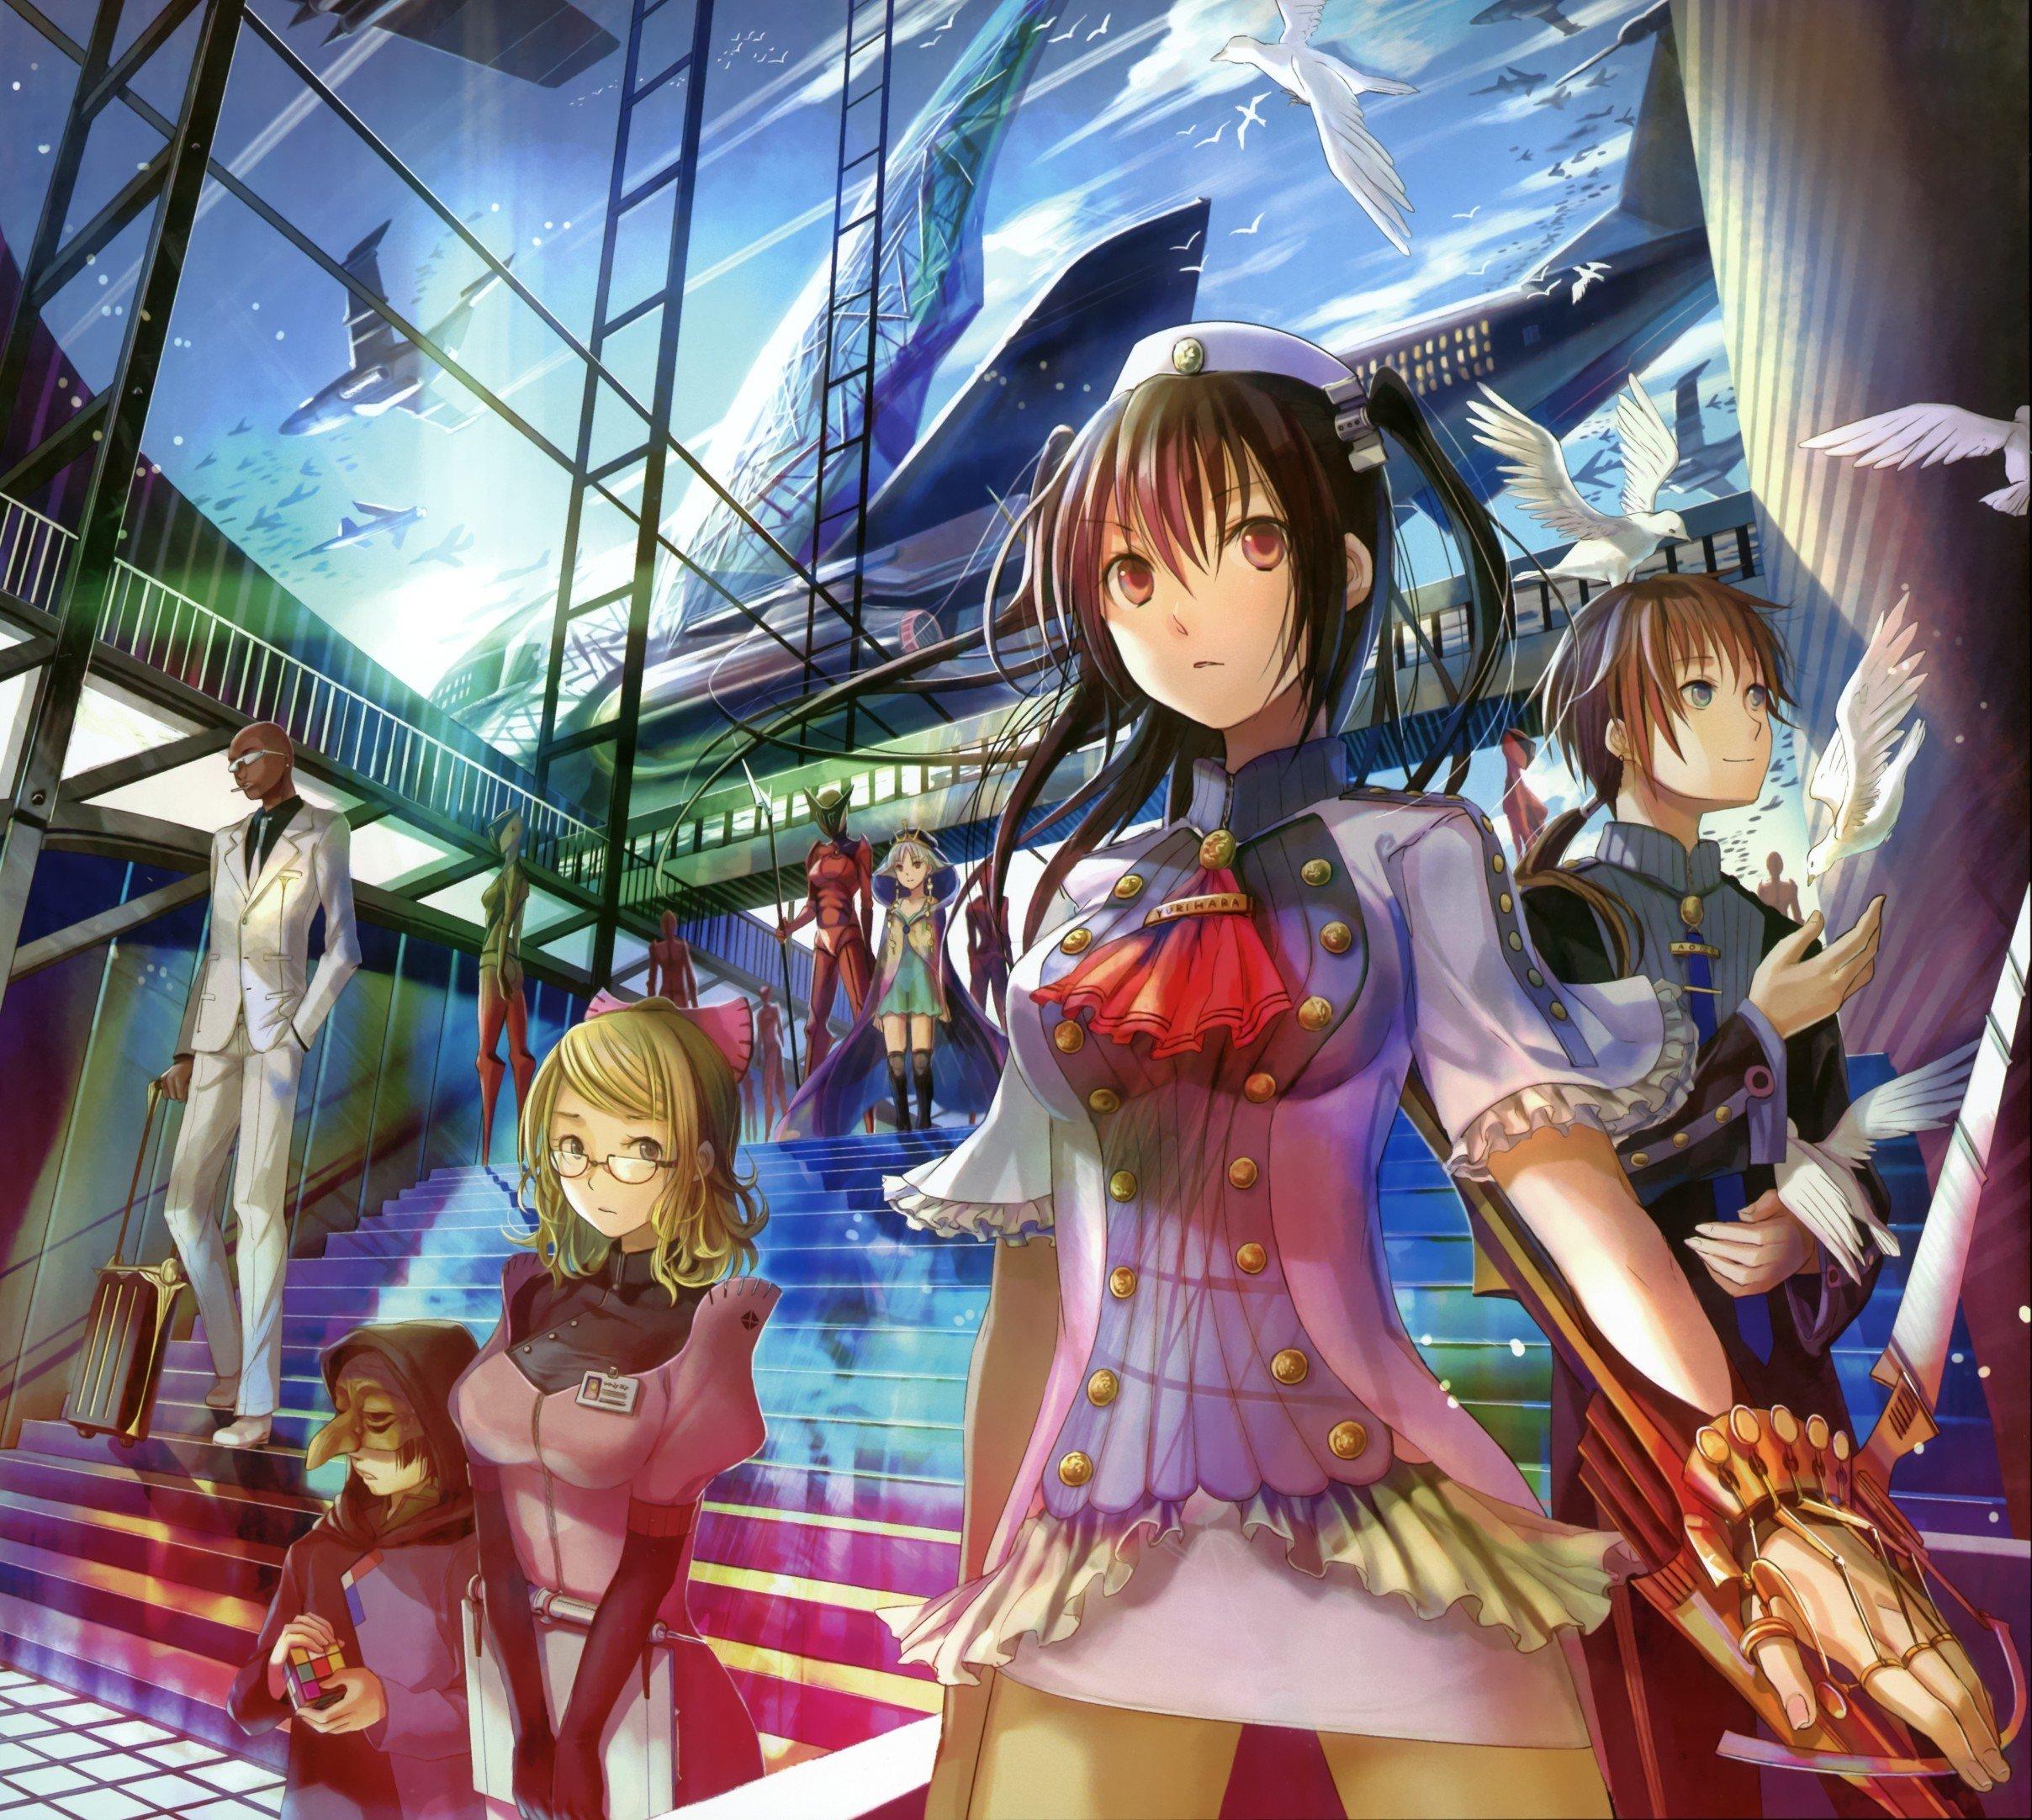 Multicolor Anime Fuji Choko Soft Shading Anime Girls